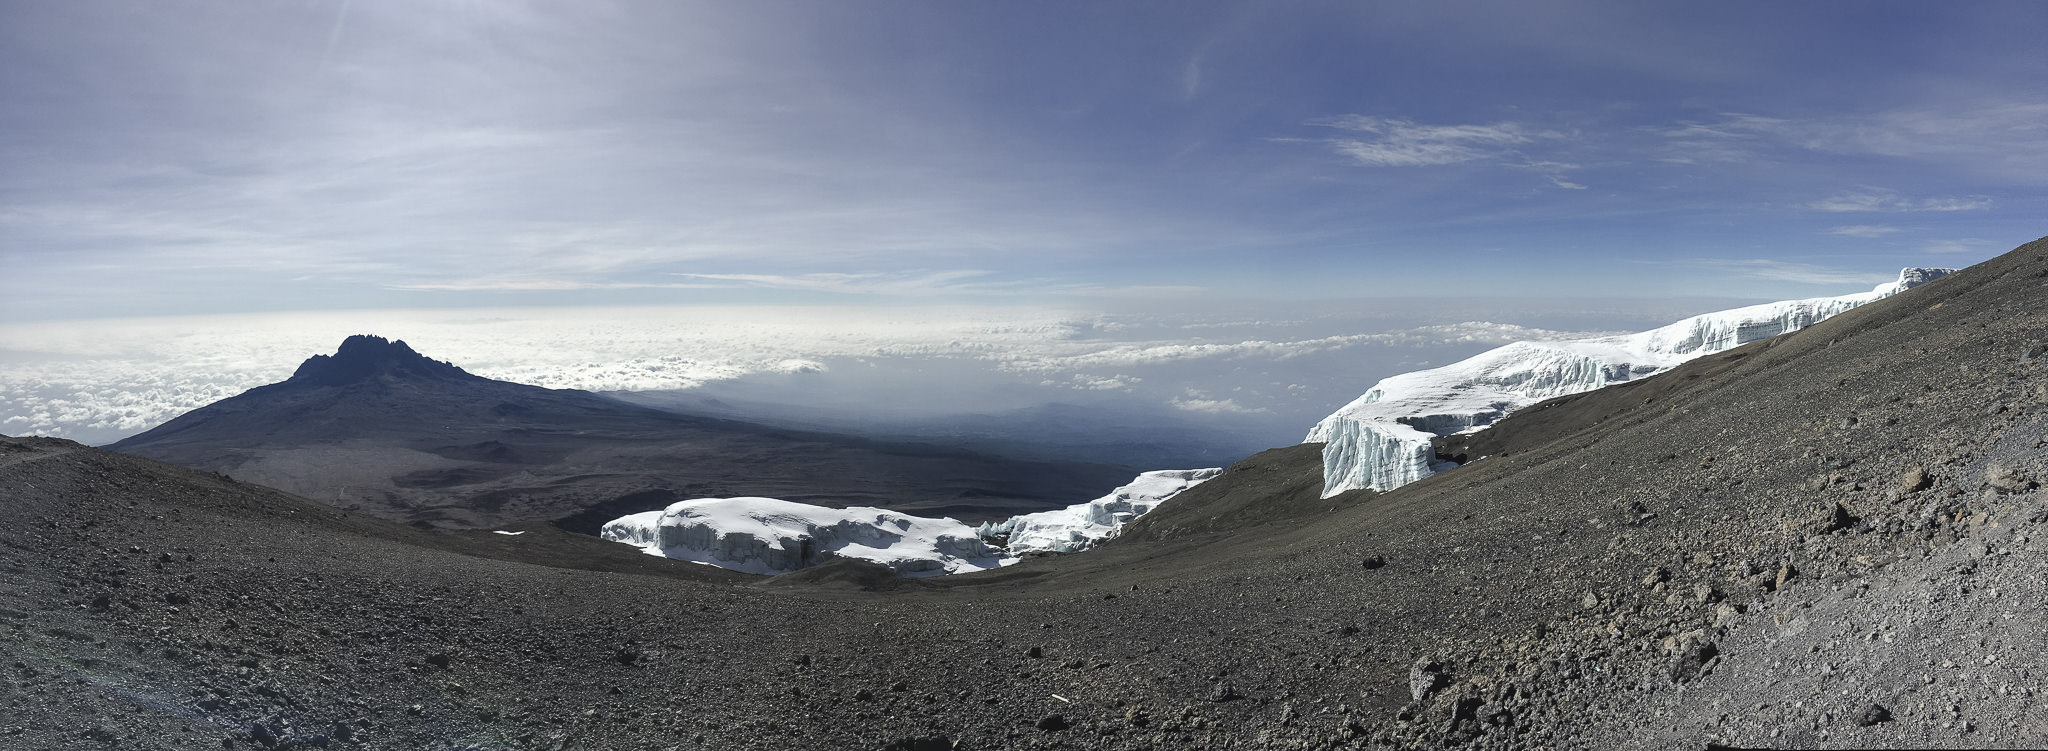 Panoramabild Kilimanjaro Gipfel